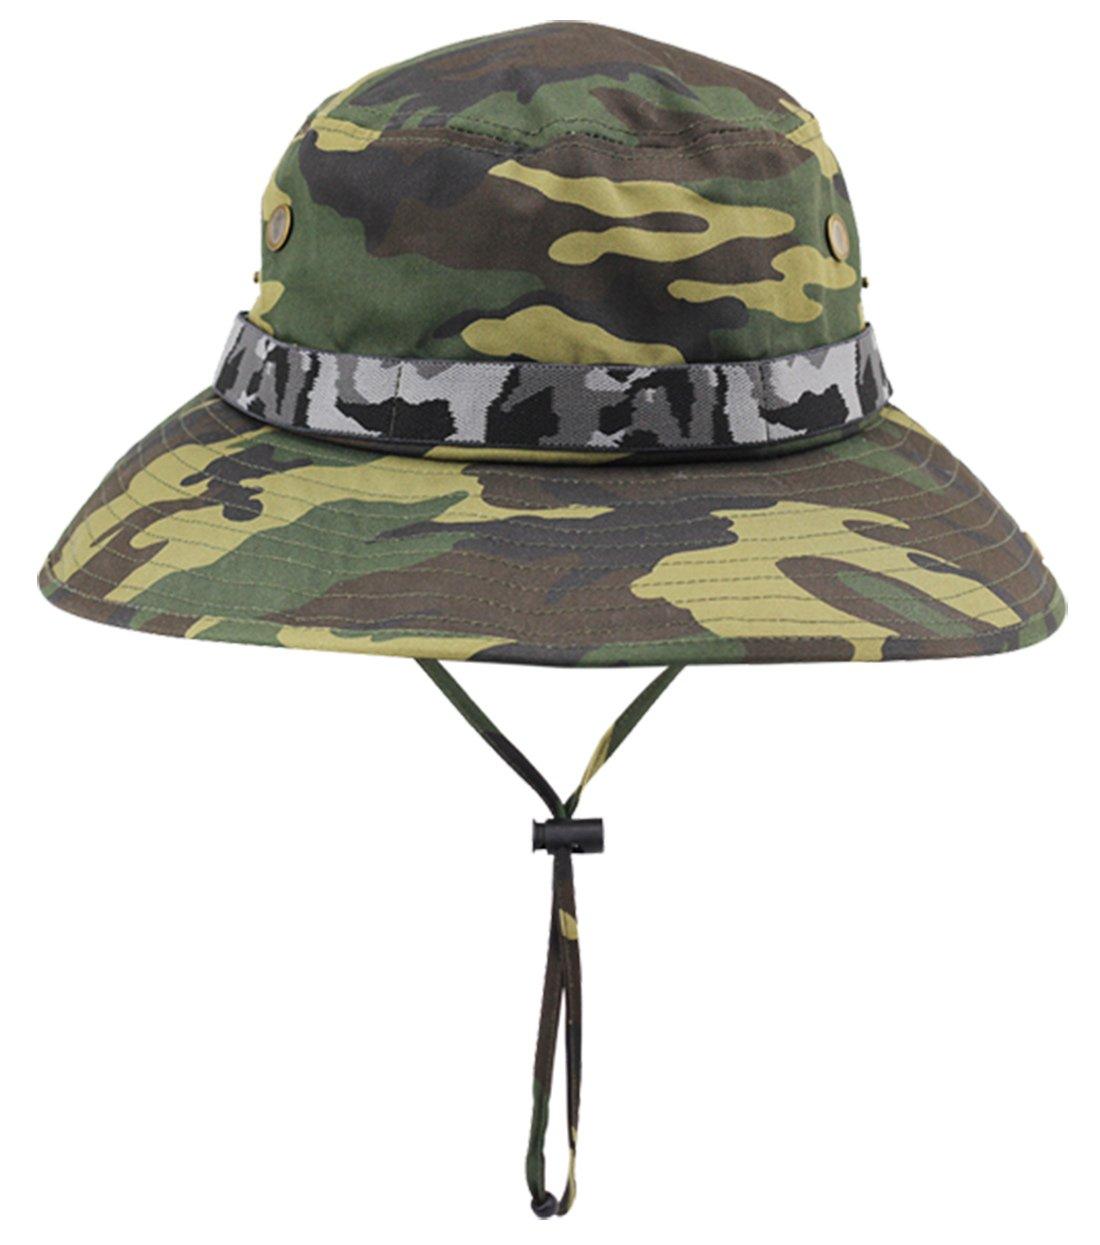 85ac996dcb815 Panegy Men Women Sun Hat Outdoor Waterproof Bucket Boonie Hat Wide Brim for  Travel Camping Hiking Fishing Hunting Boating Safari Cap Camouflage